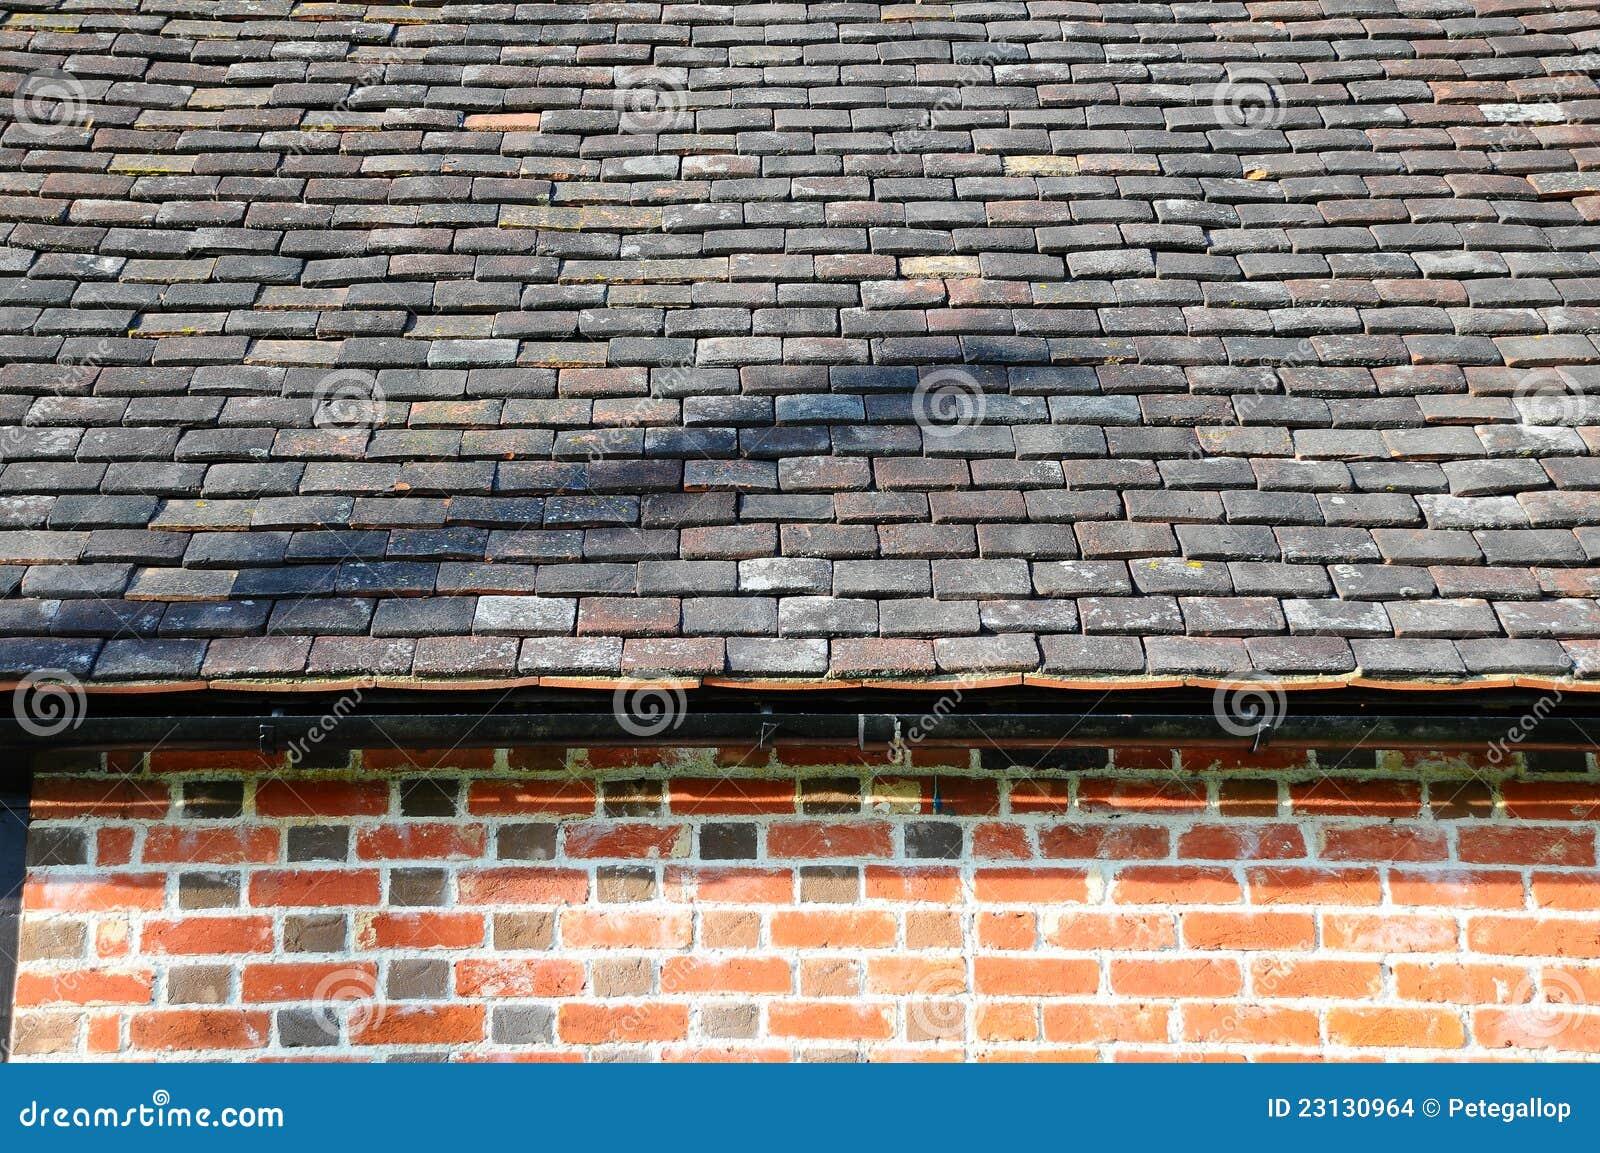 Bricks And Tiles Stock Photo Image Of Tiles Brick